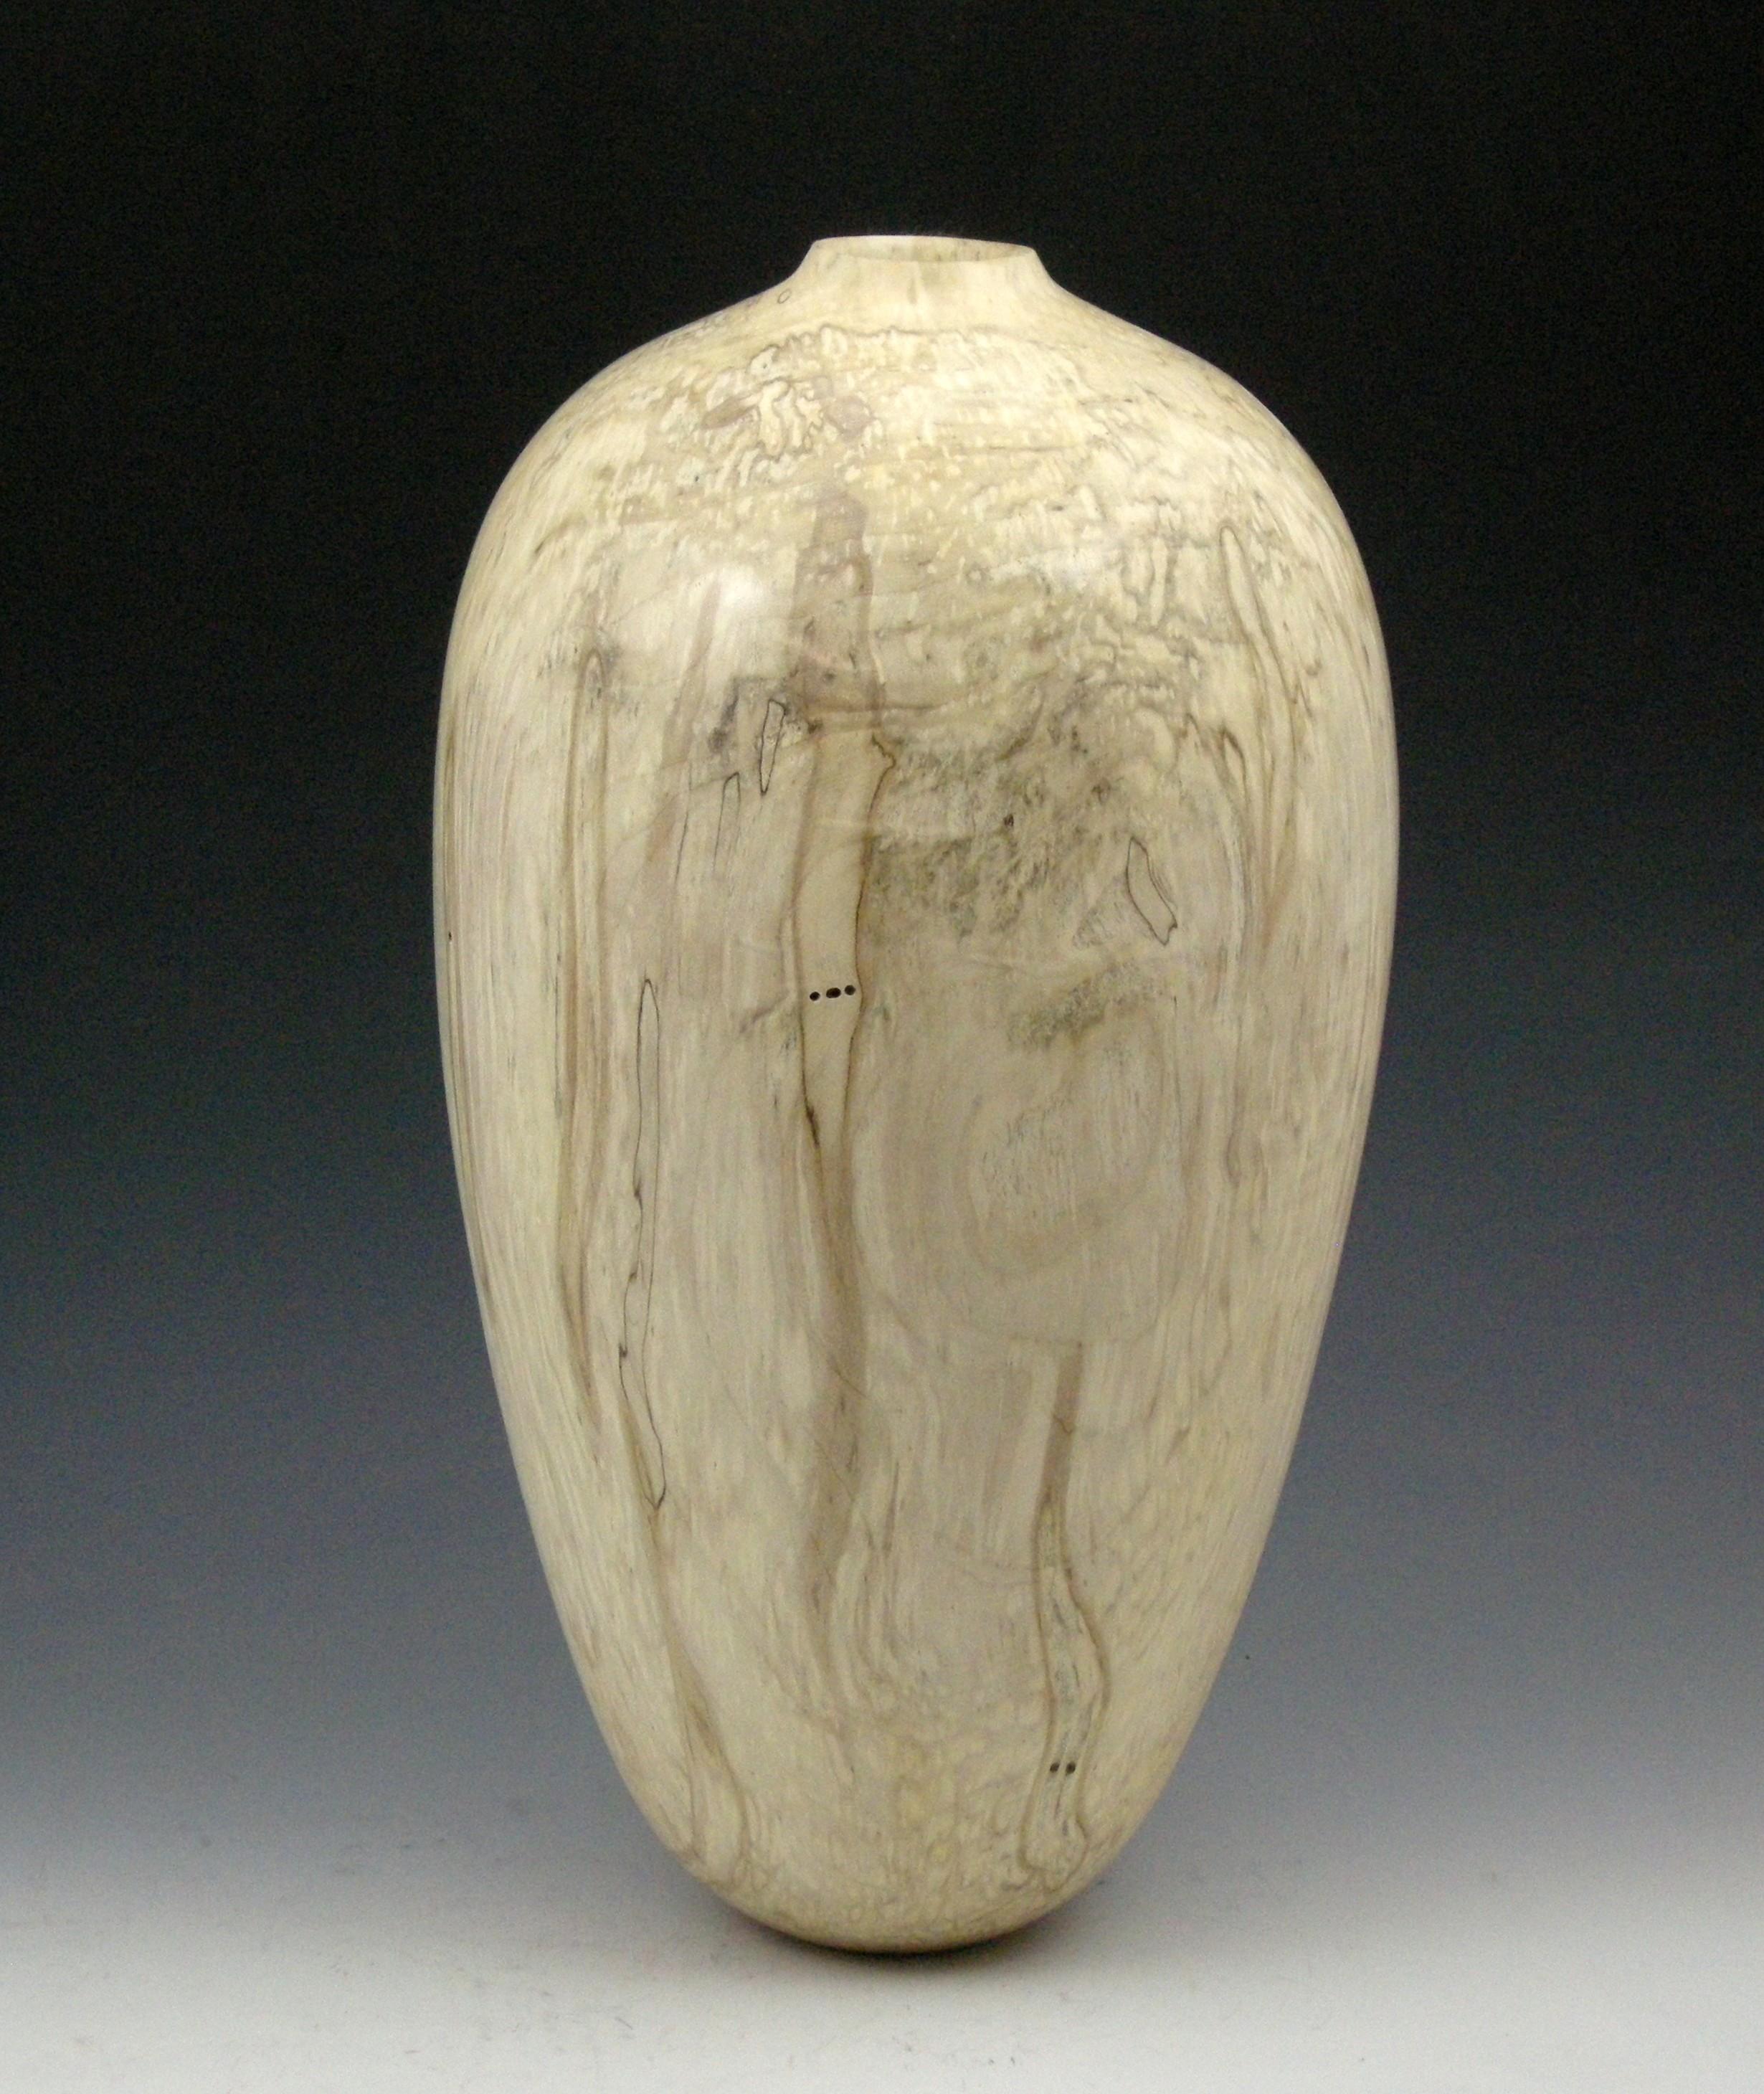 Marbleized Maple Vessel